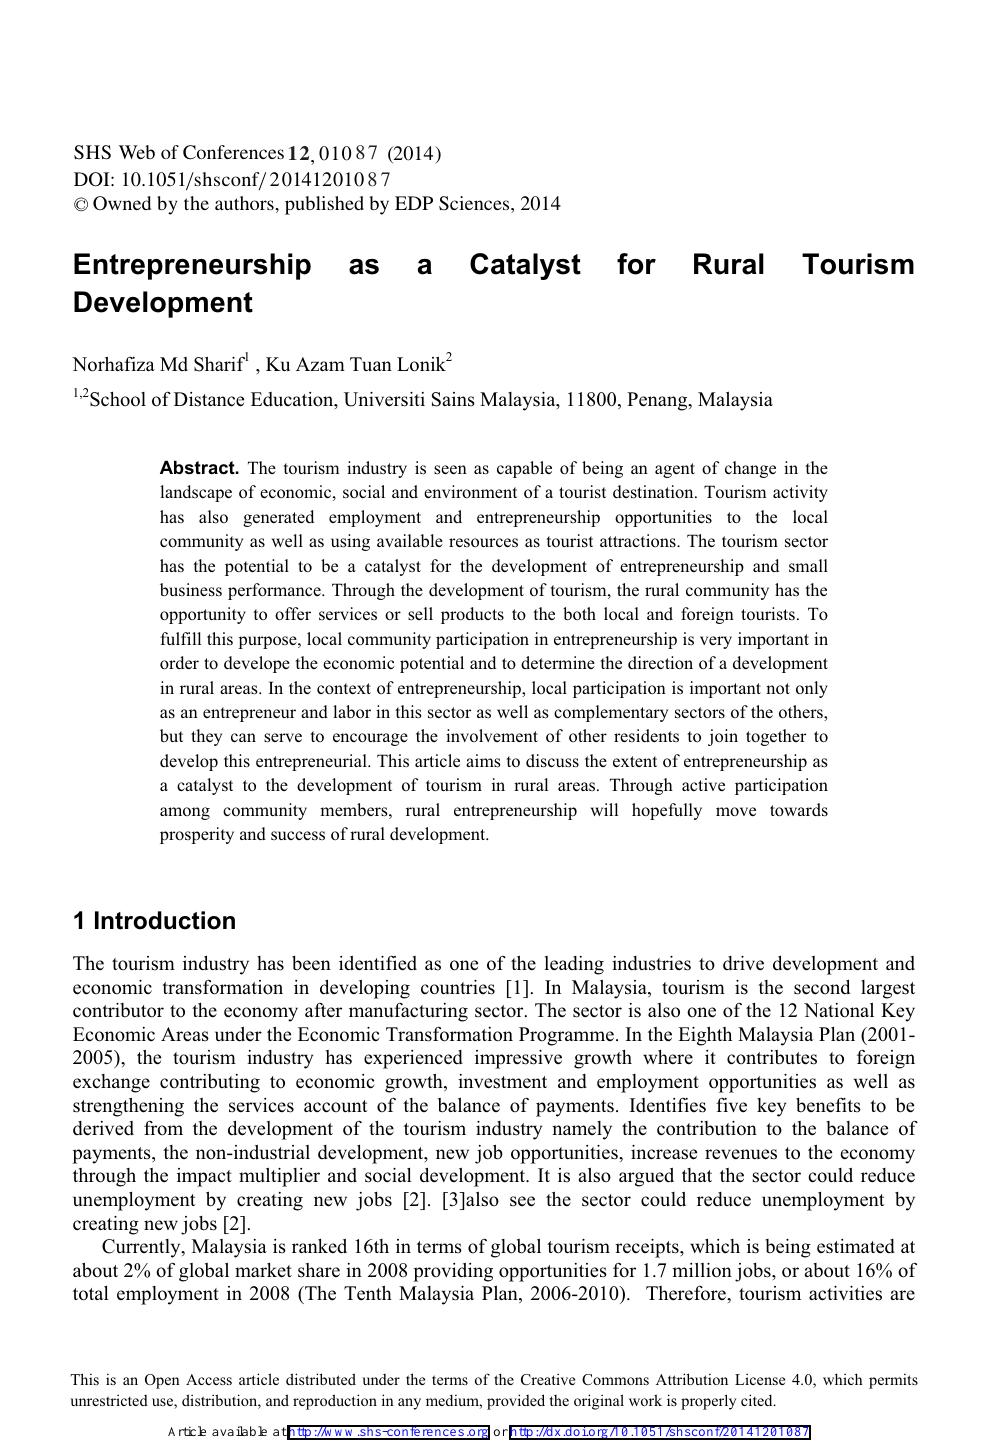 Entrepreneurship as a Catalyst for Rural Tourism Development – topic